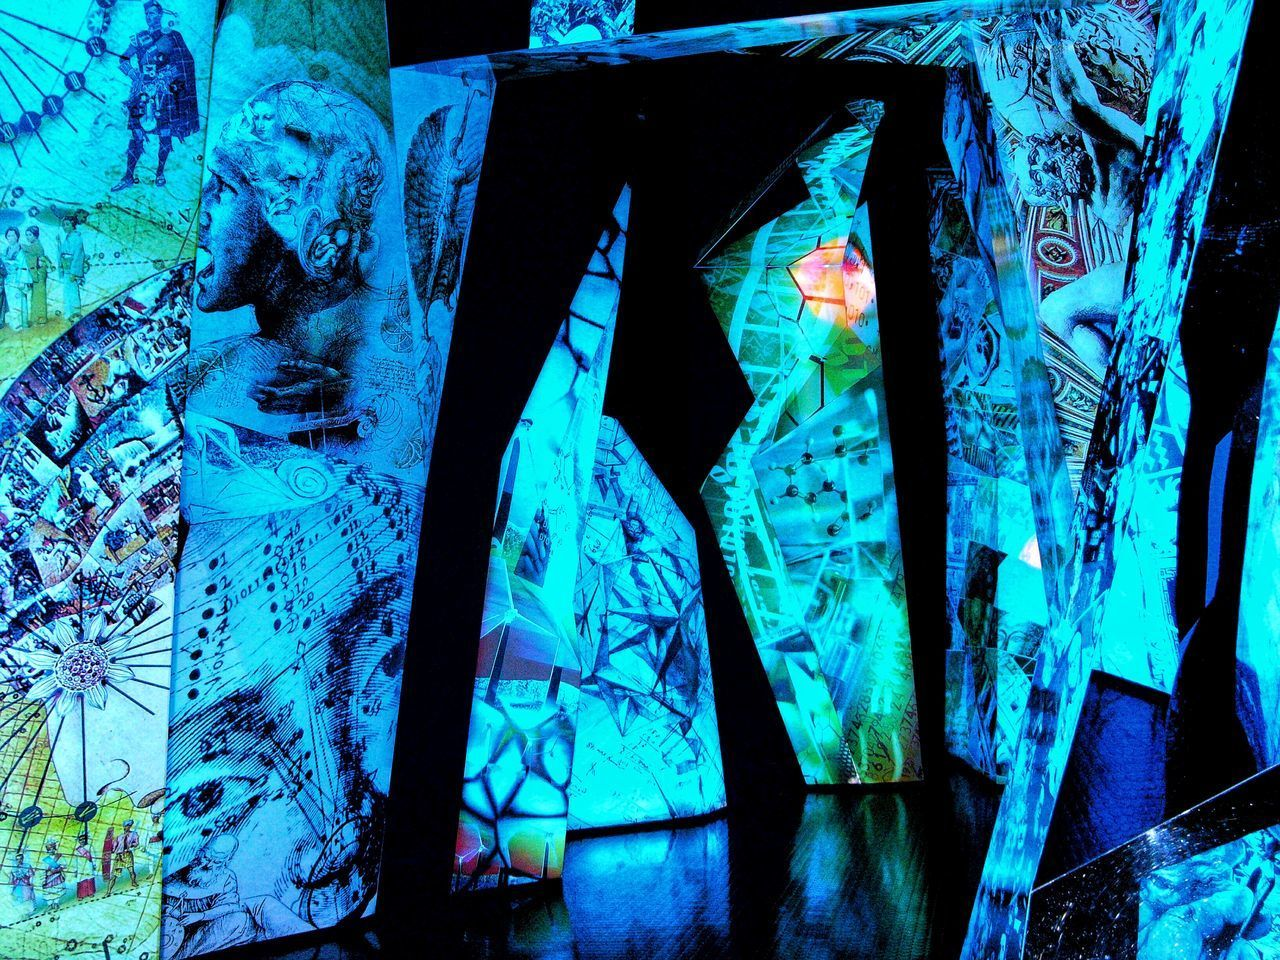 Blue Art Installation Blue Color, Swarovski Museum Kristallwelten Innsbruck Artistic Expression Museo Swarowskj